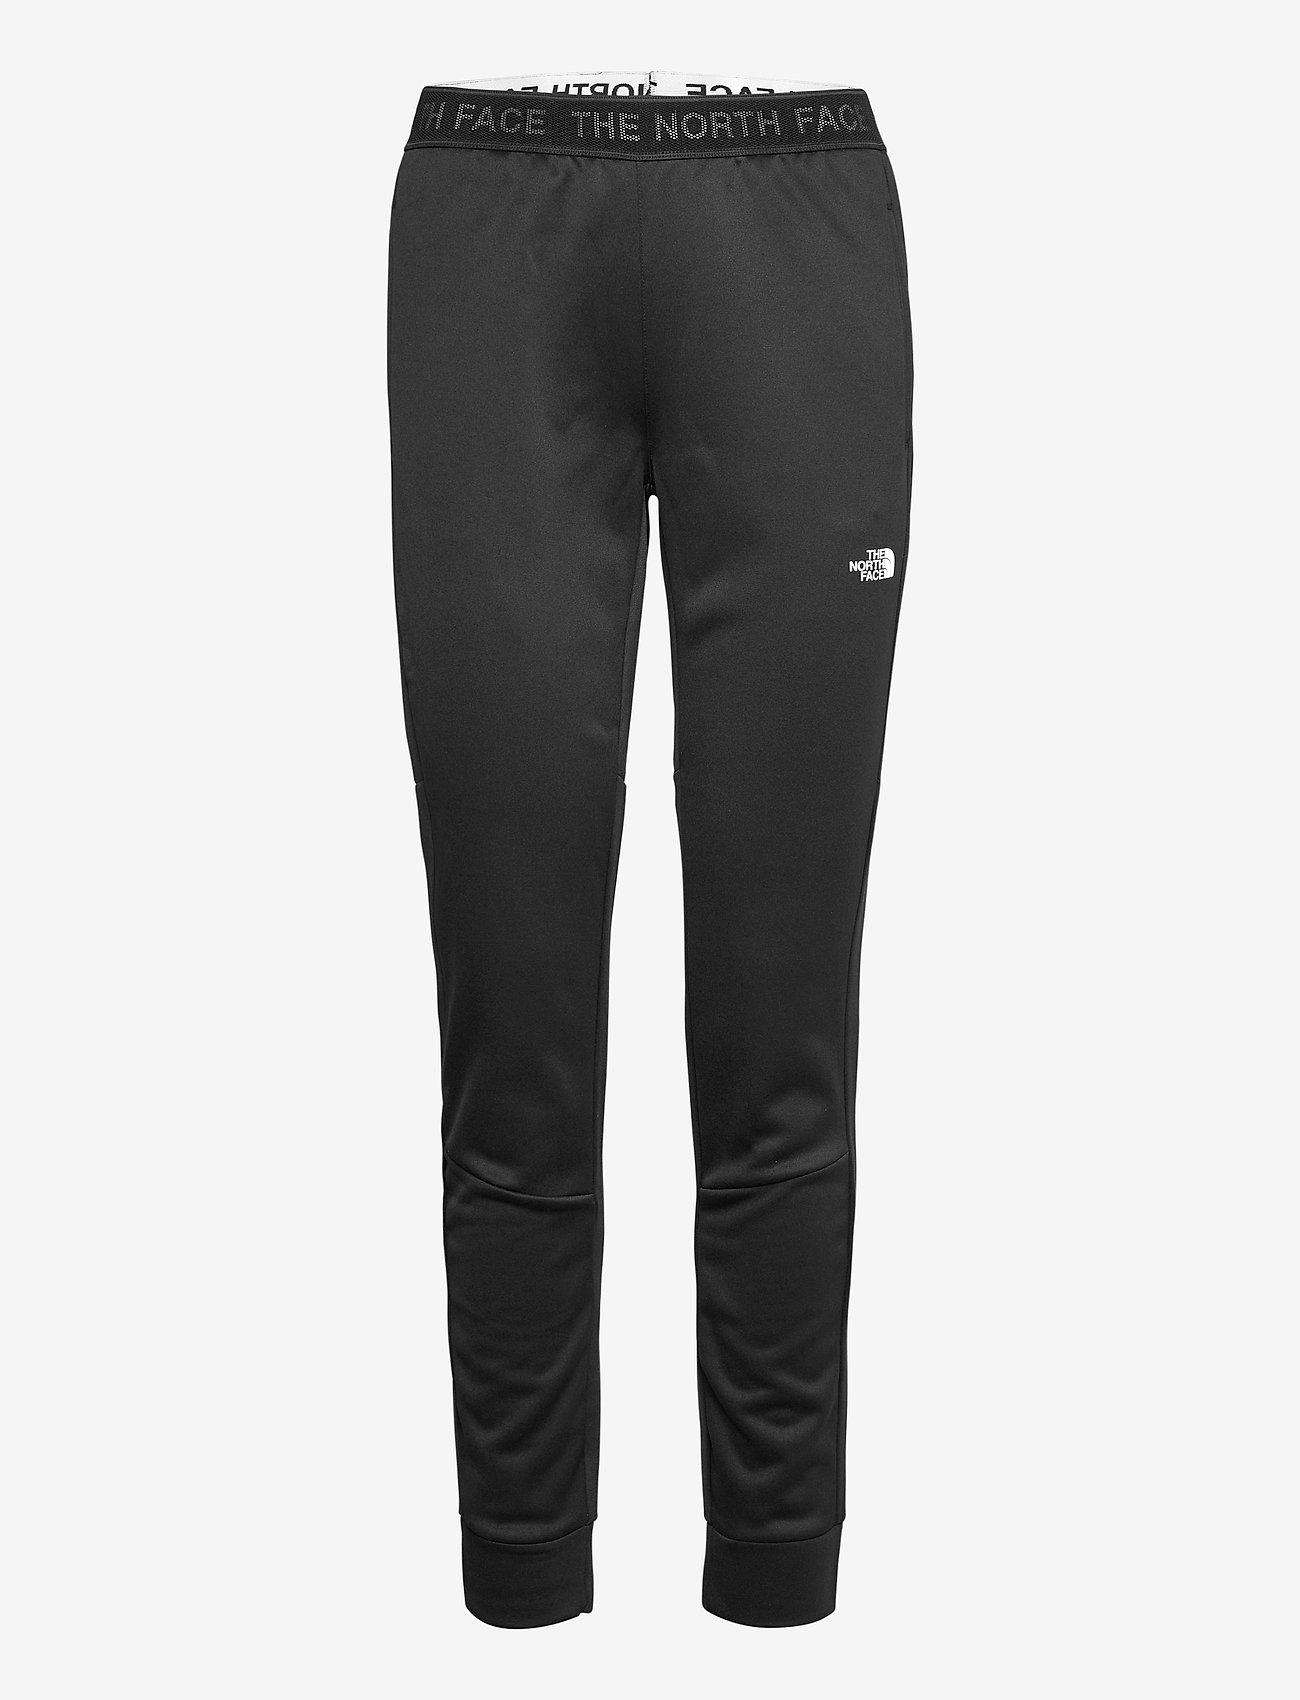 The North Face - W TNL PANT - pantalon de randonnée - tnf black - 0